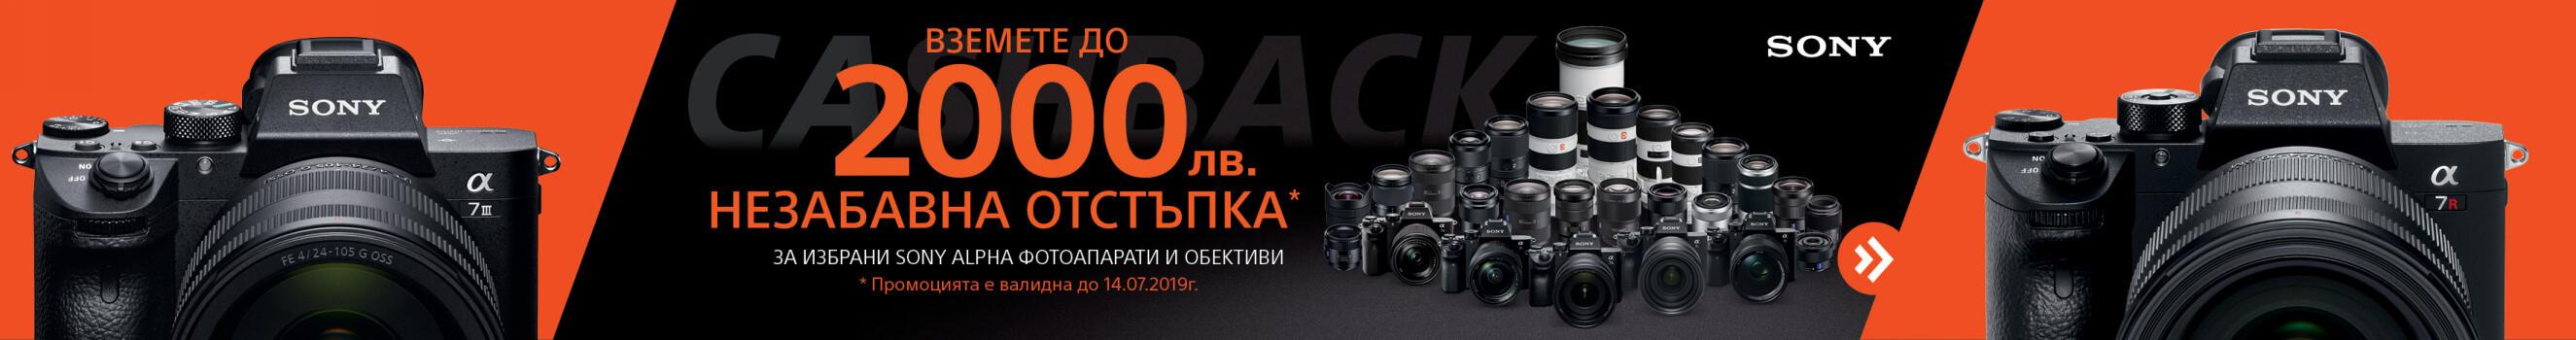 Фотоапарати и обективи Sony на промоционални цени